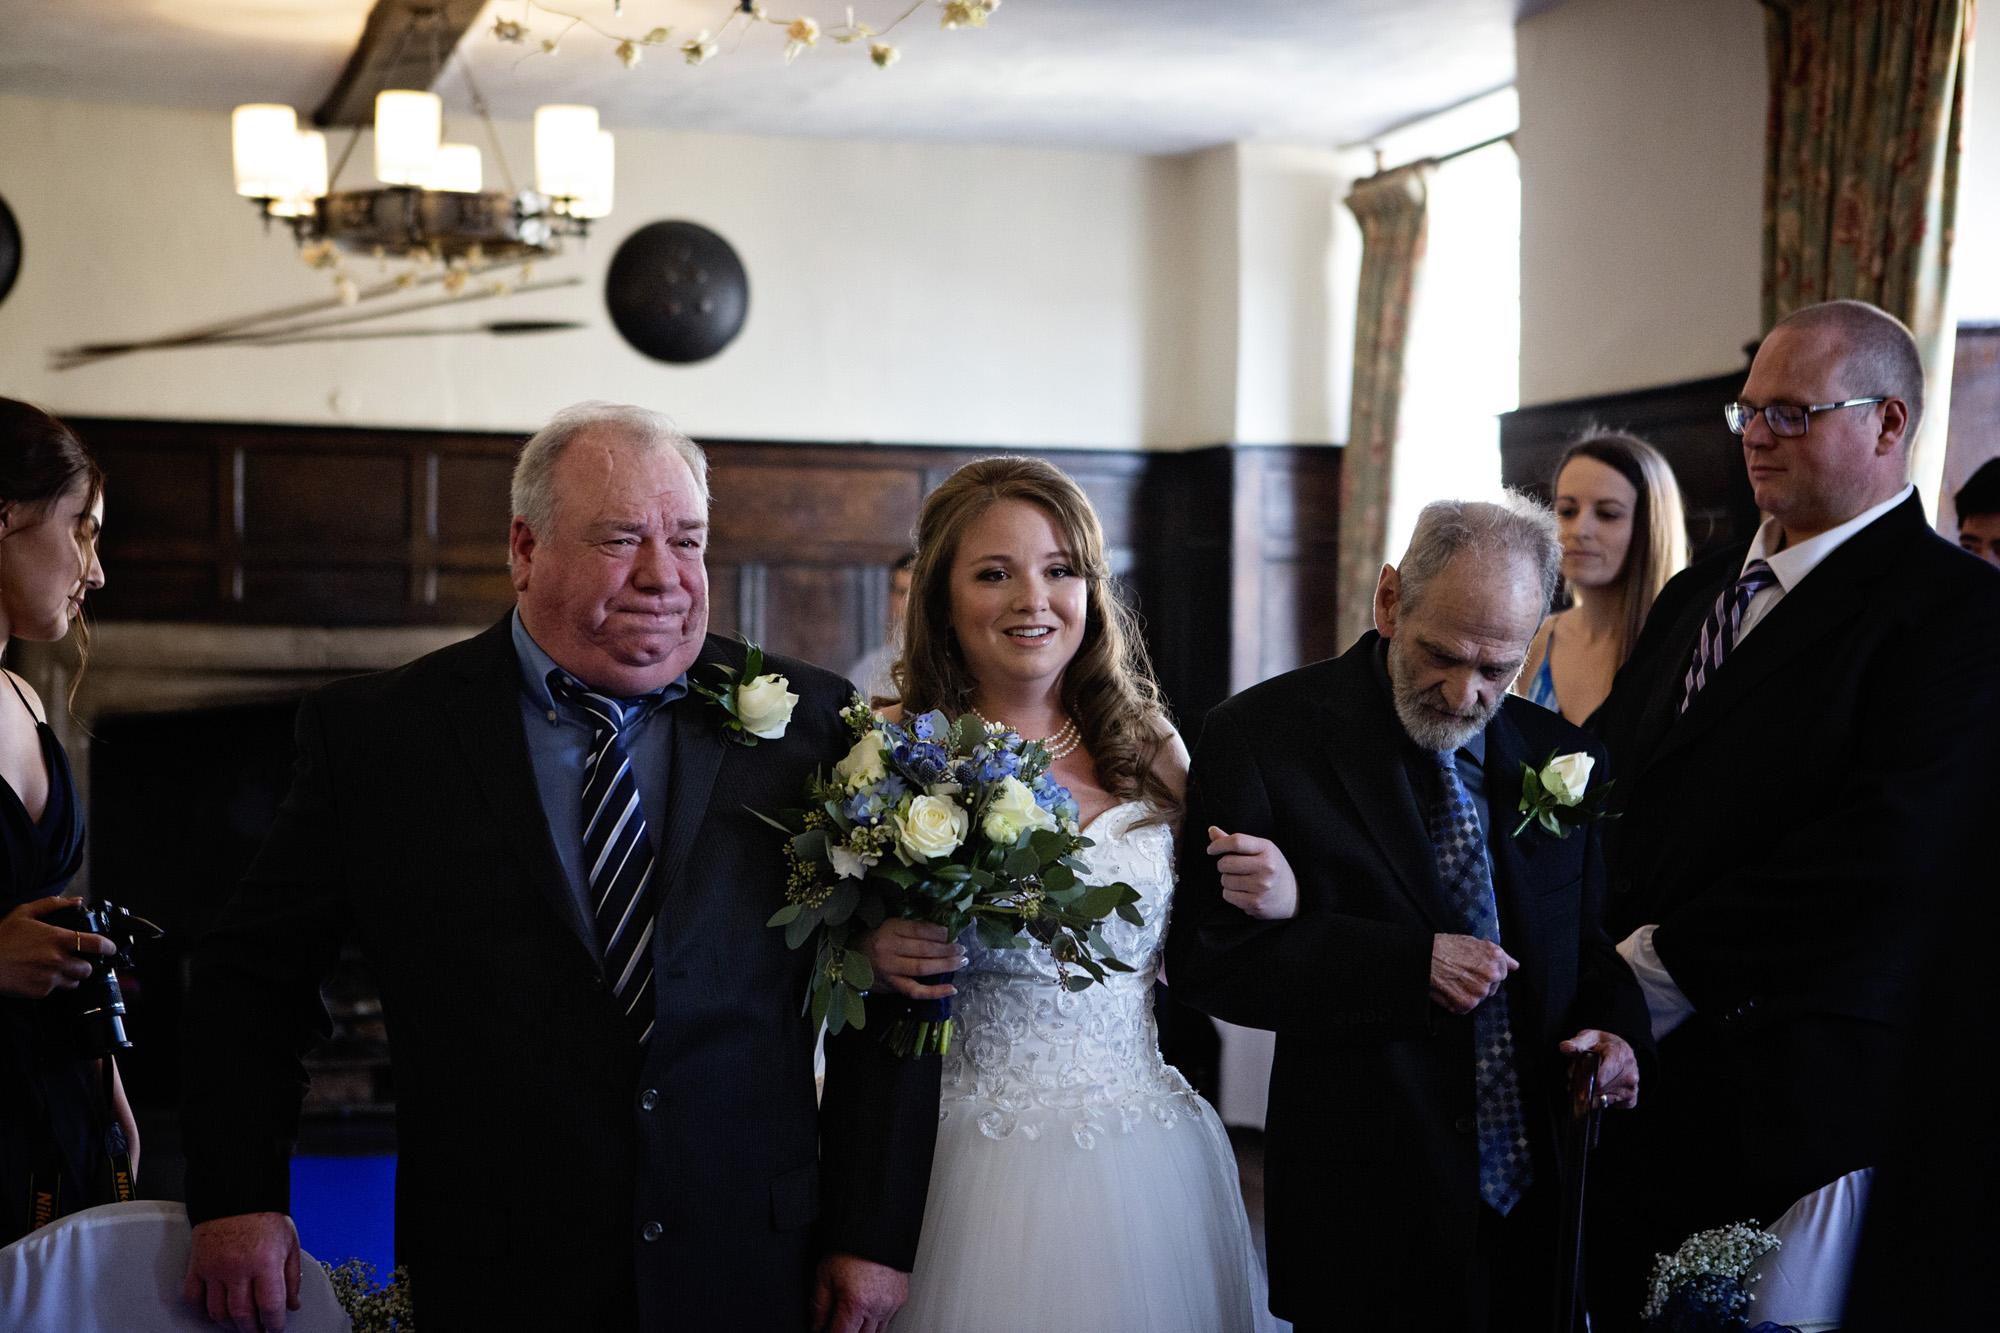 wedding-photos-talbot-hotel-oundle (12).jpg